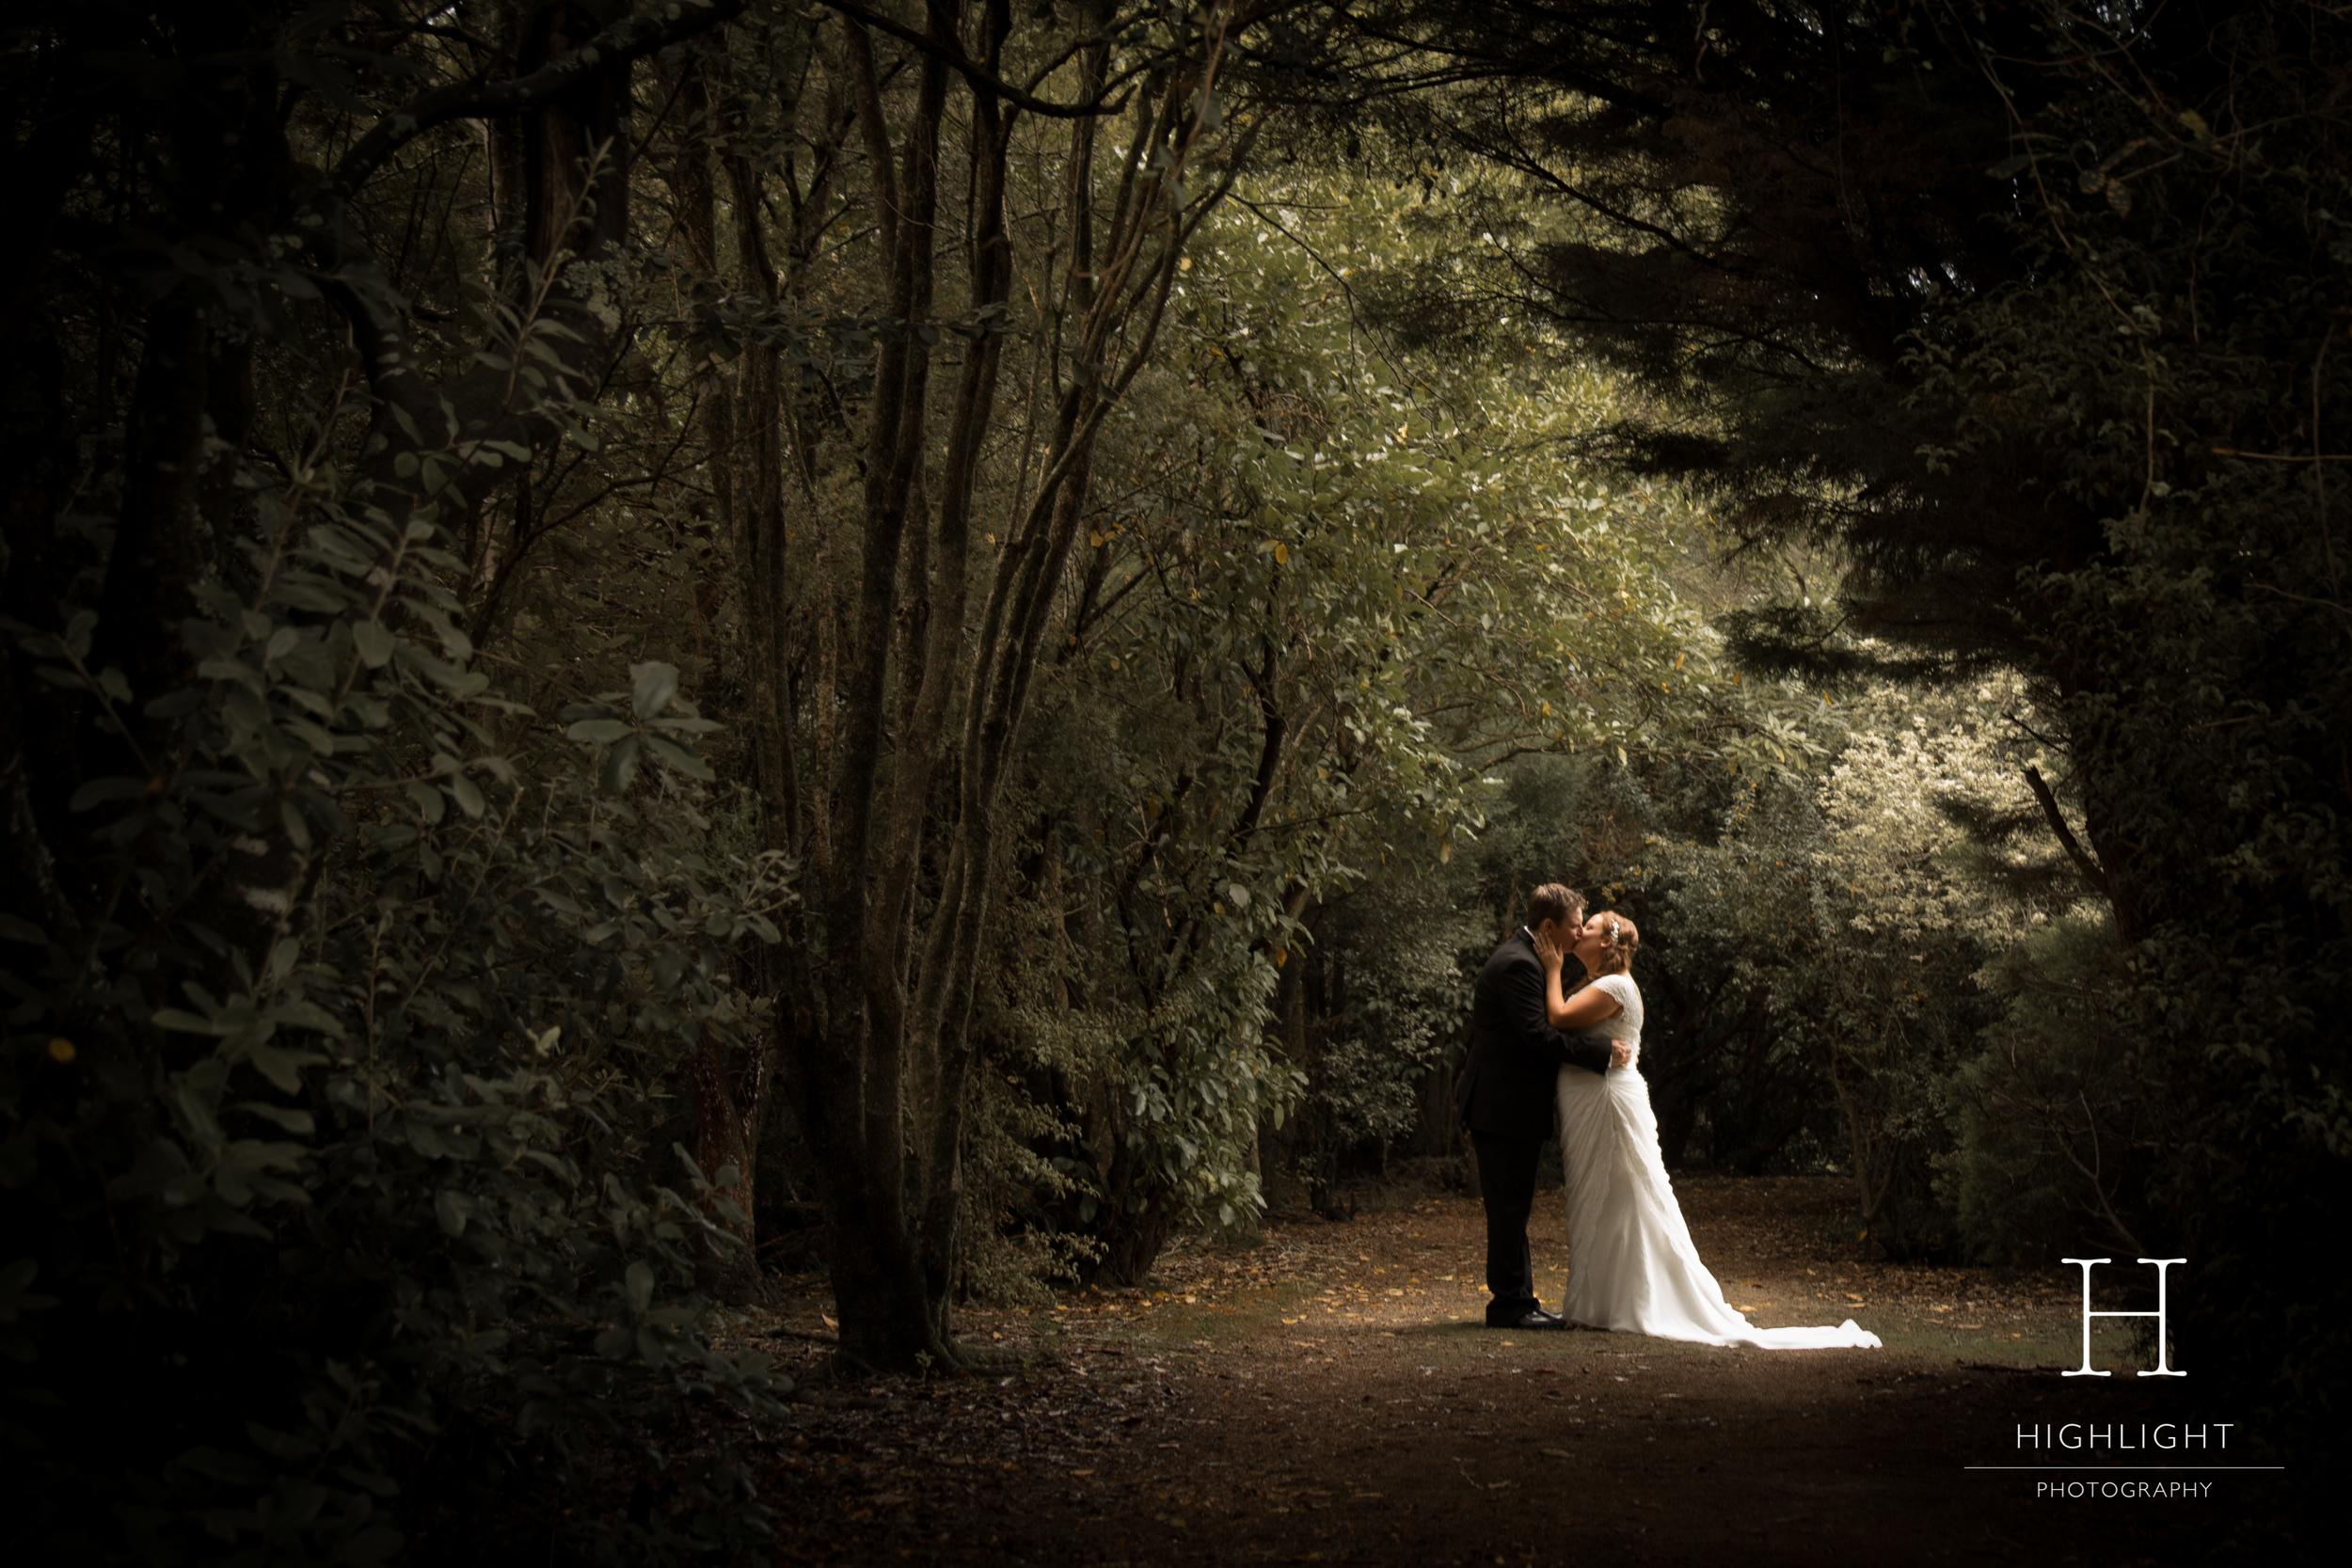 highlight_photography_wedding_new_zealand_forest.jpg